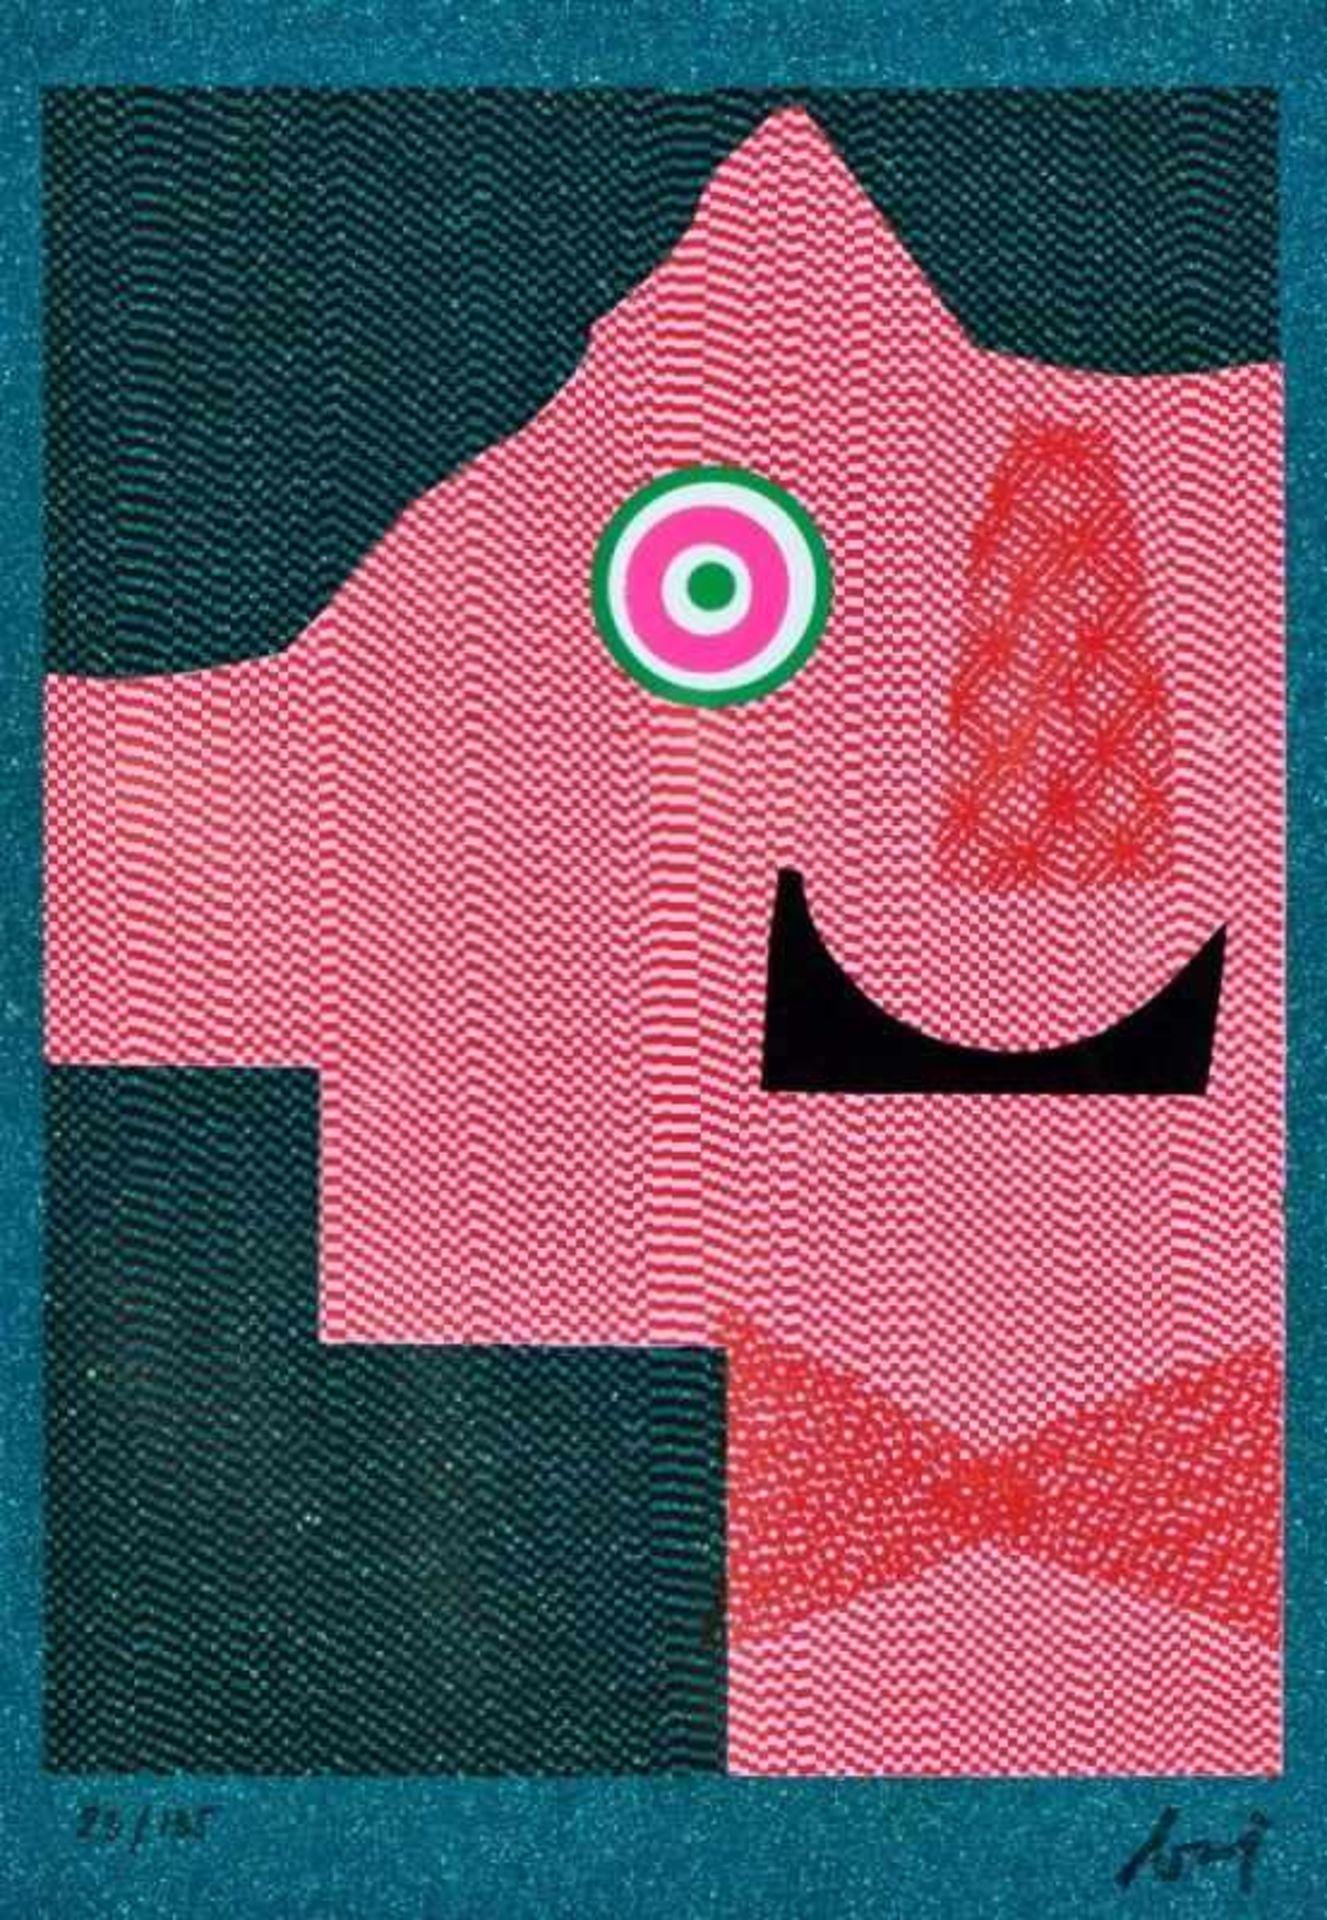 ENRICO BAJ(1924 MAILAND - 2003 VERGIATE)AMBIGUÍTE, 1970Farbserigrafie auf Plastik, Blattgröße: 55